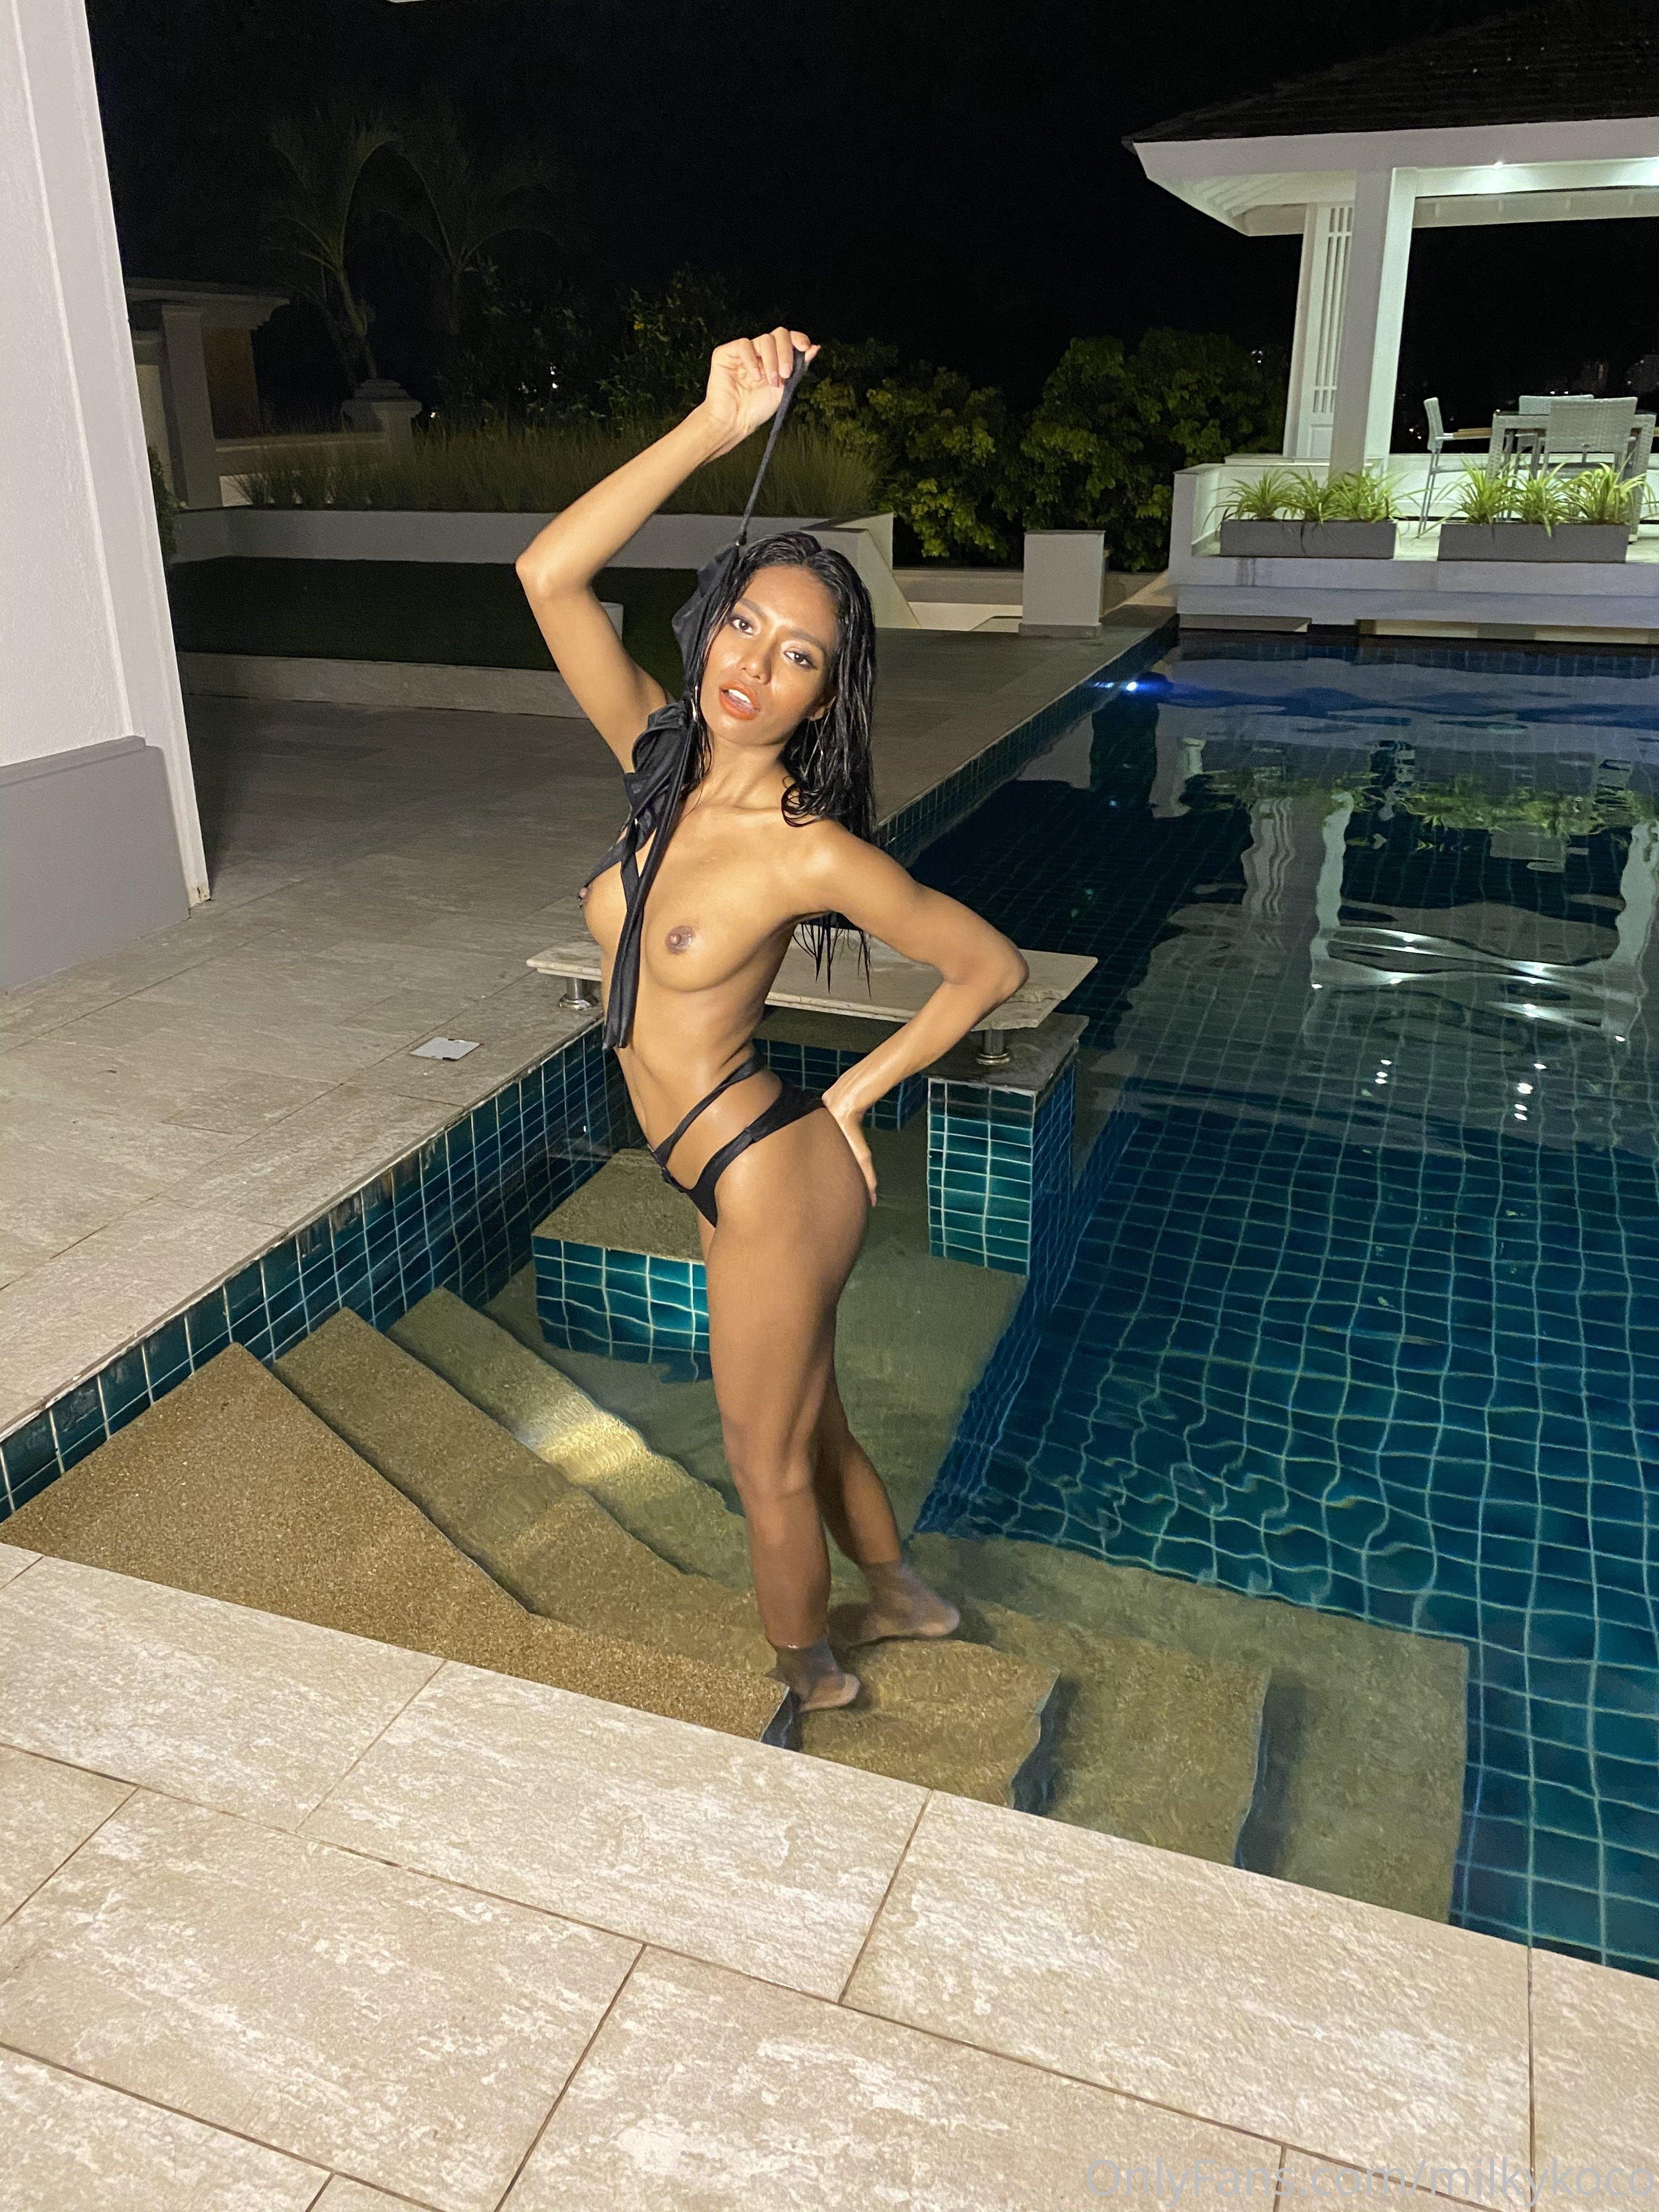 Koko Mylk Bangkok Model Leaked Onlyfans 0070